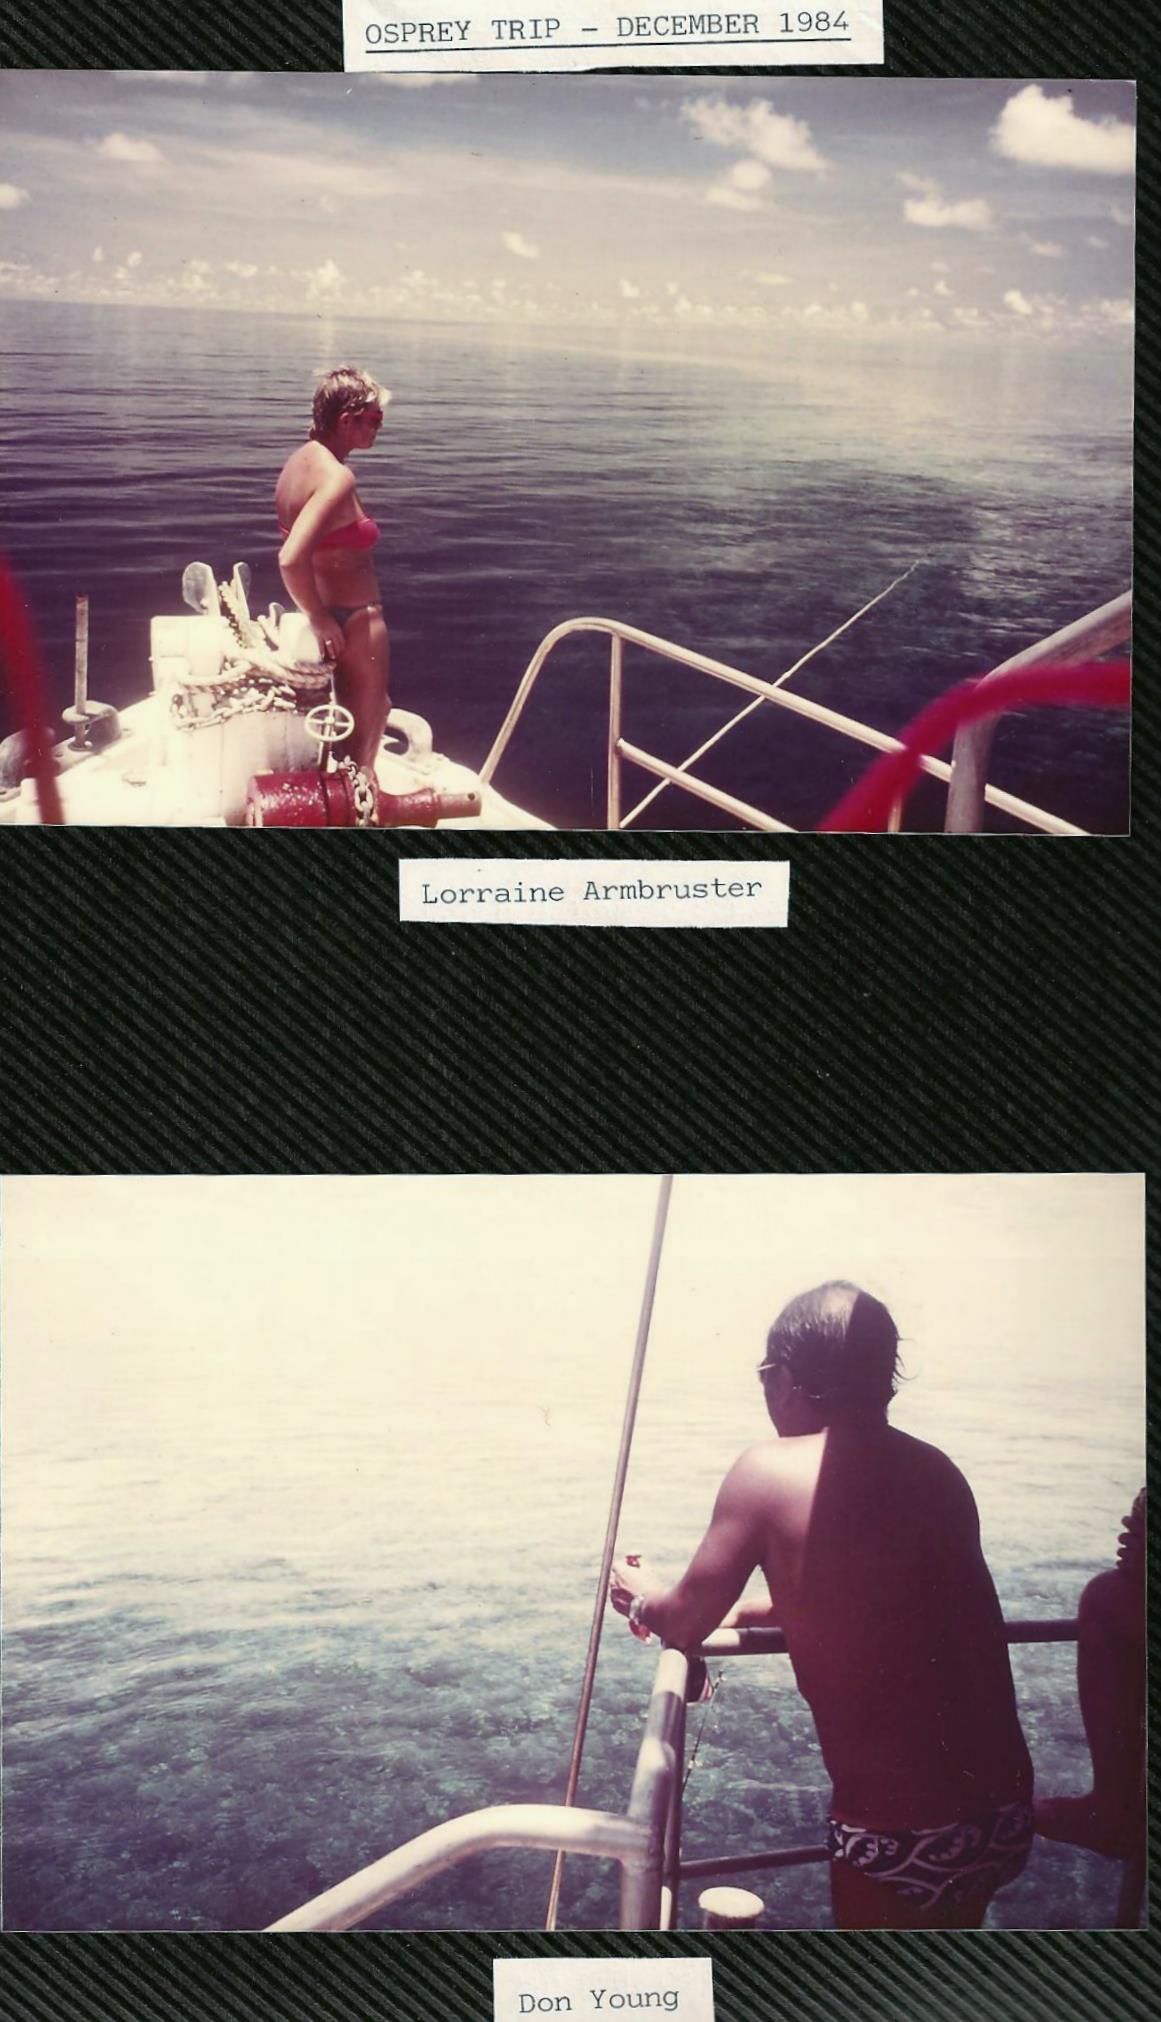 1984_OspreyTrip_03